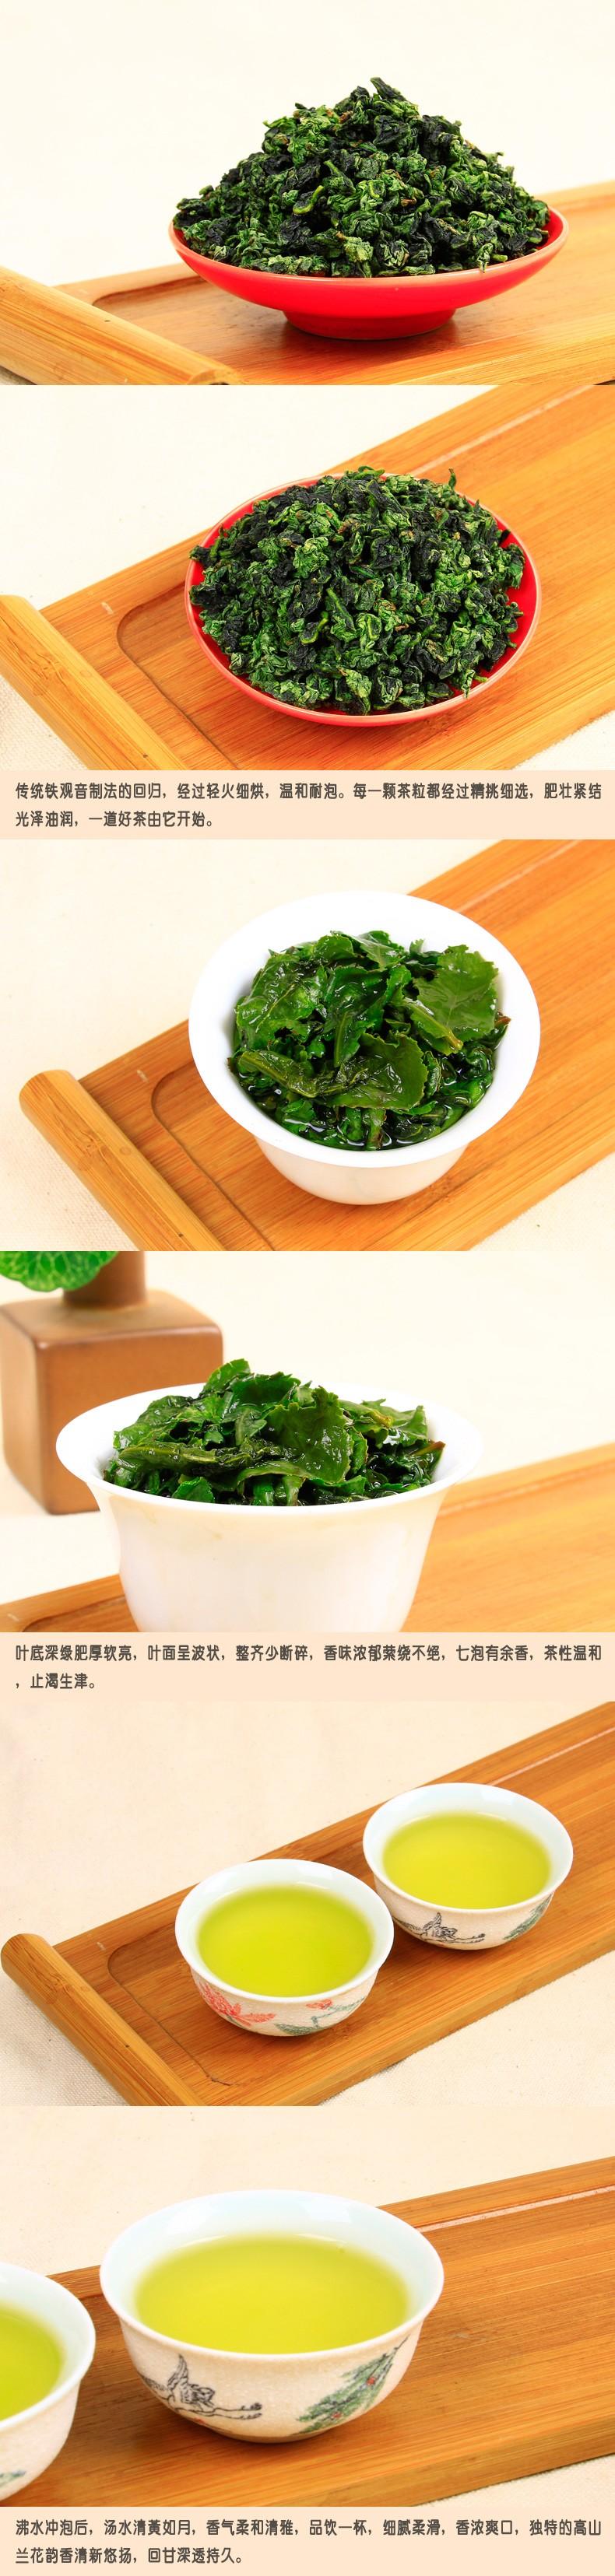 Зеленый Tikuanyin Чай фото